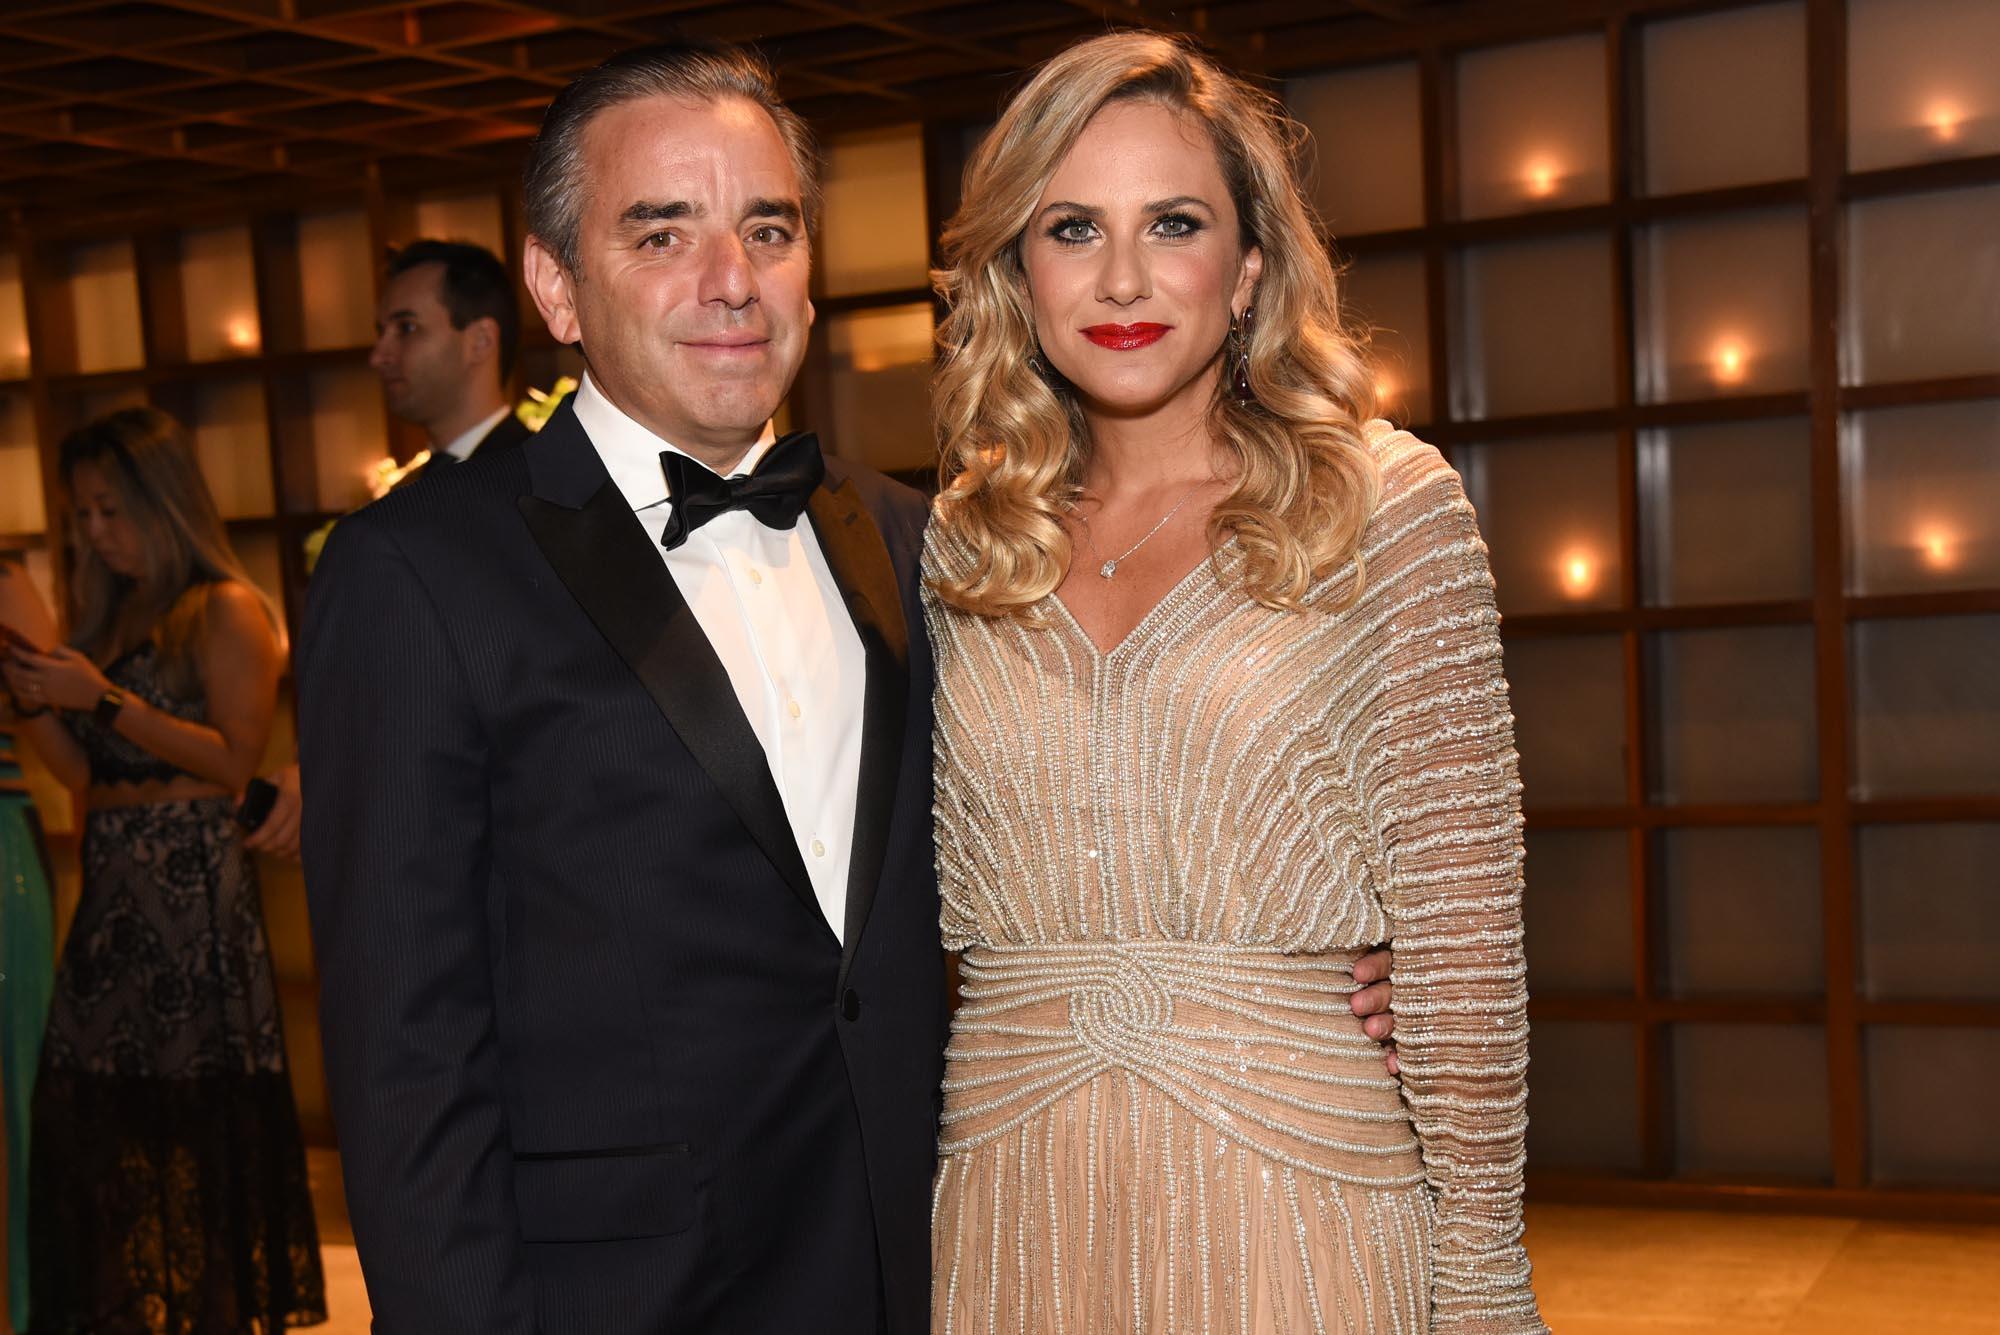 Guti e Fernanda Vidigal V BrazilFoundation Gala São Paulo Chanel 2018 Filantropia Brasil Philanthropy Brazil